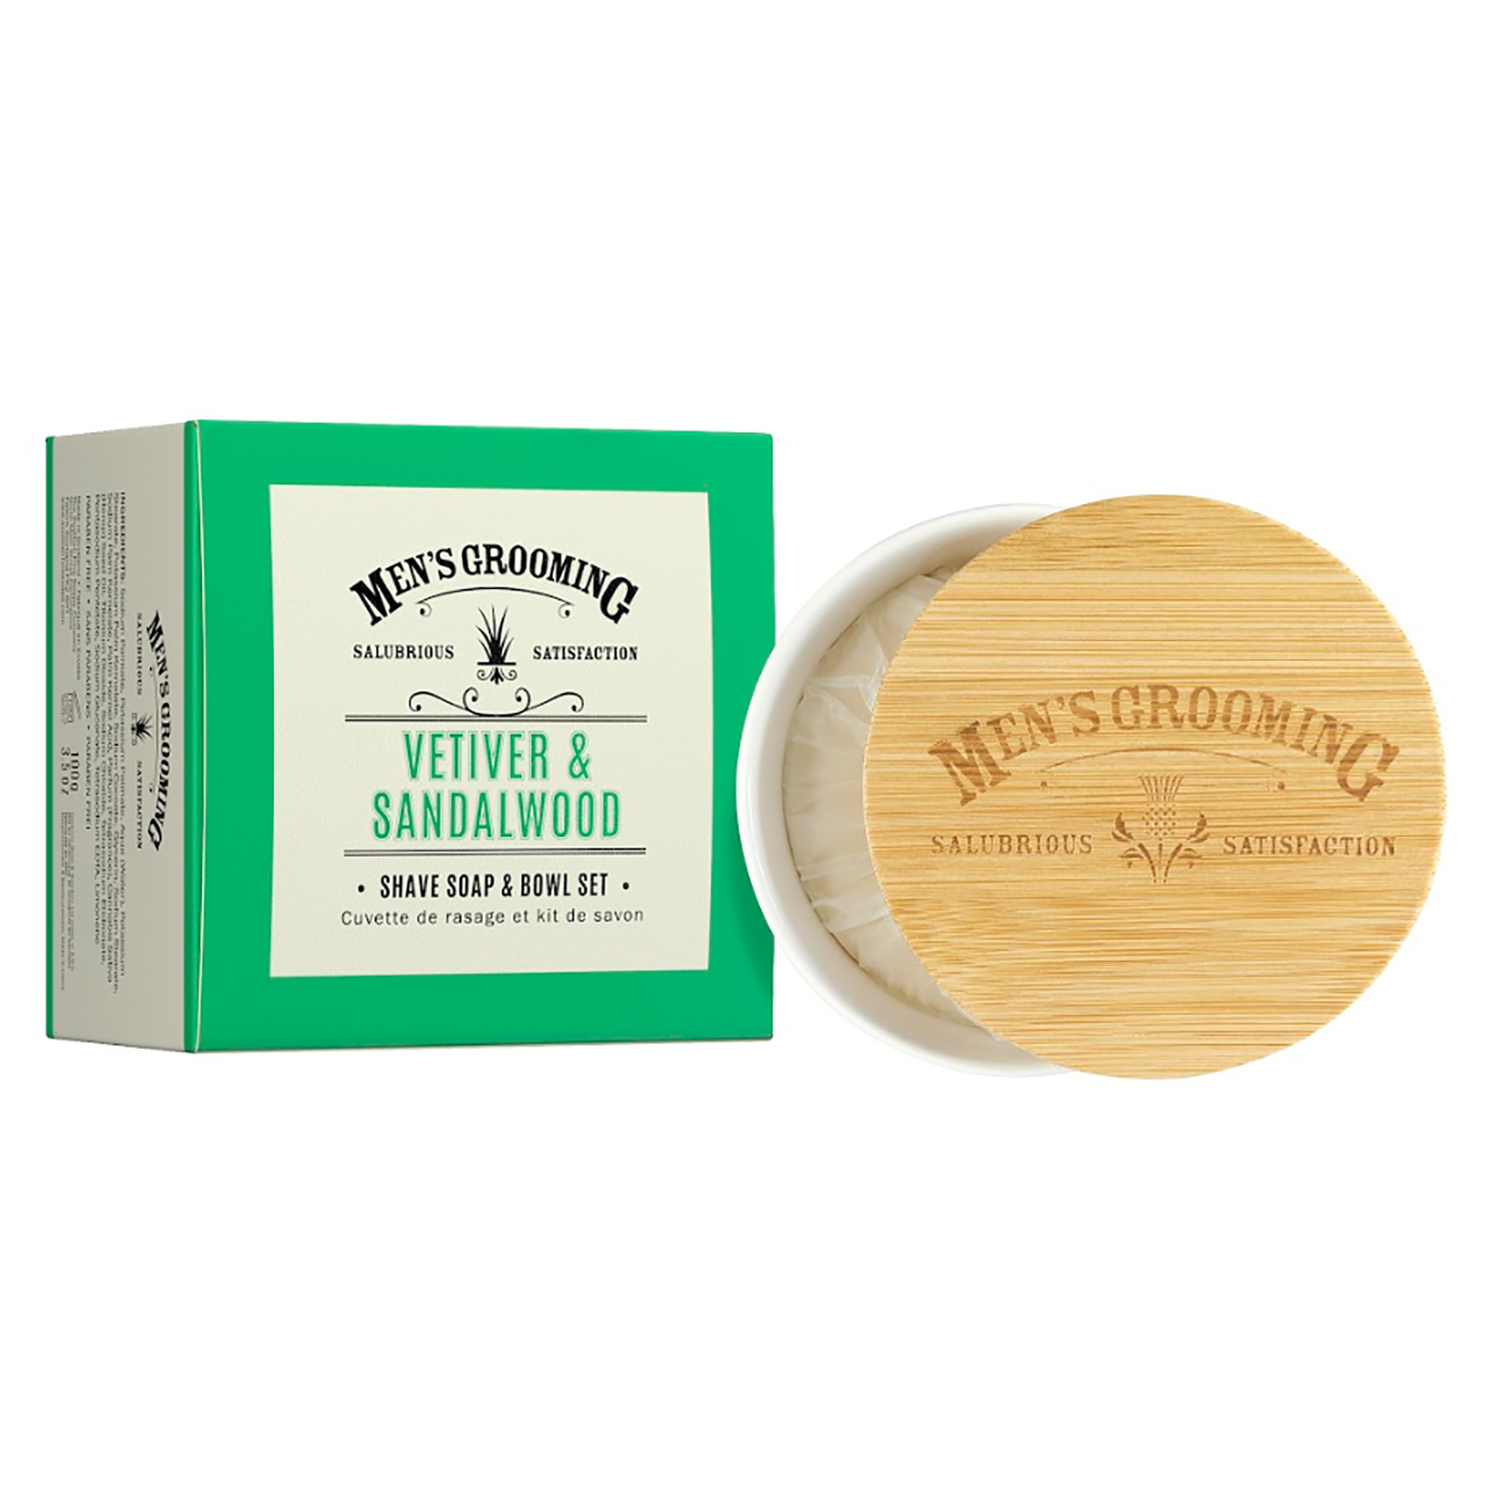 The Scottish Fine Soaps Company – Vetiver & Sandalwood Shave Soap and Bowl Set